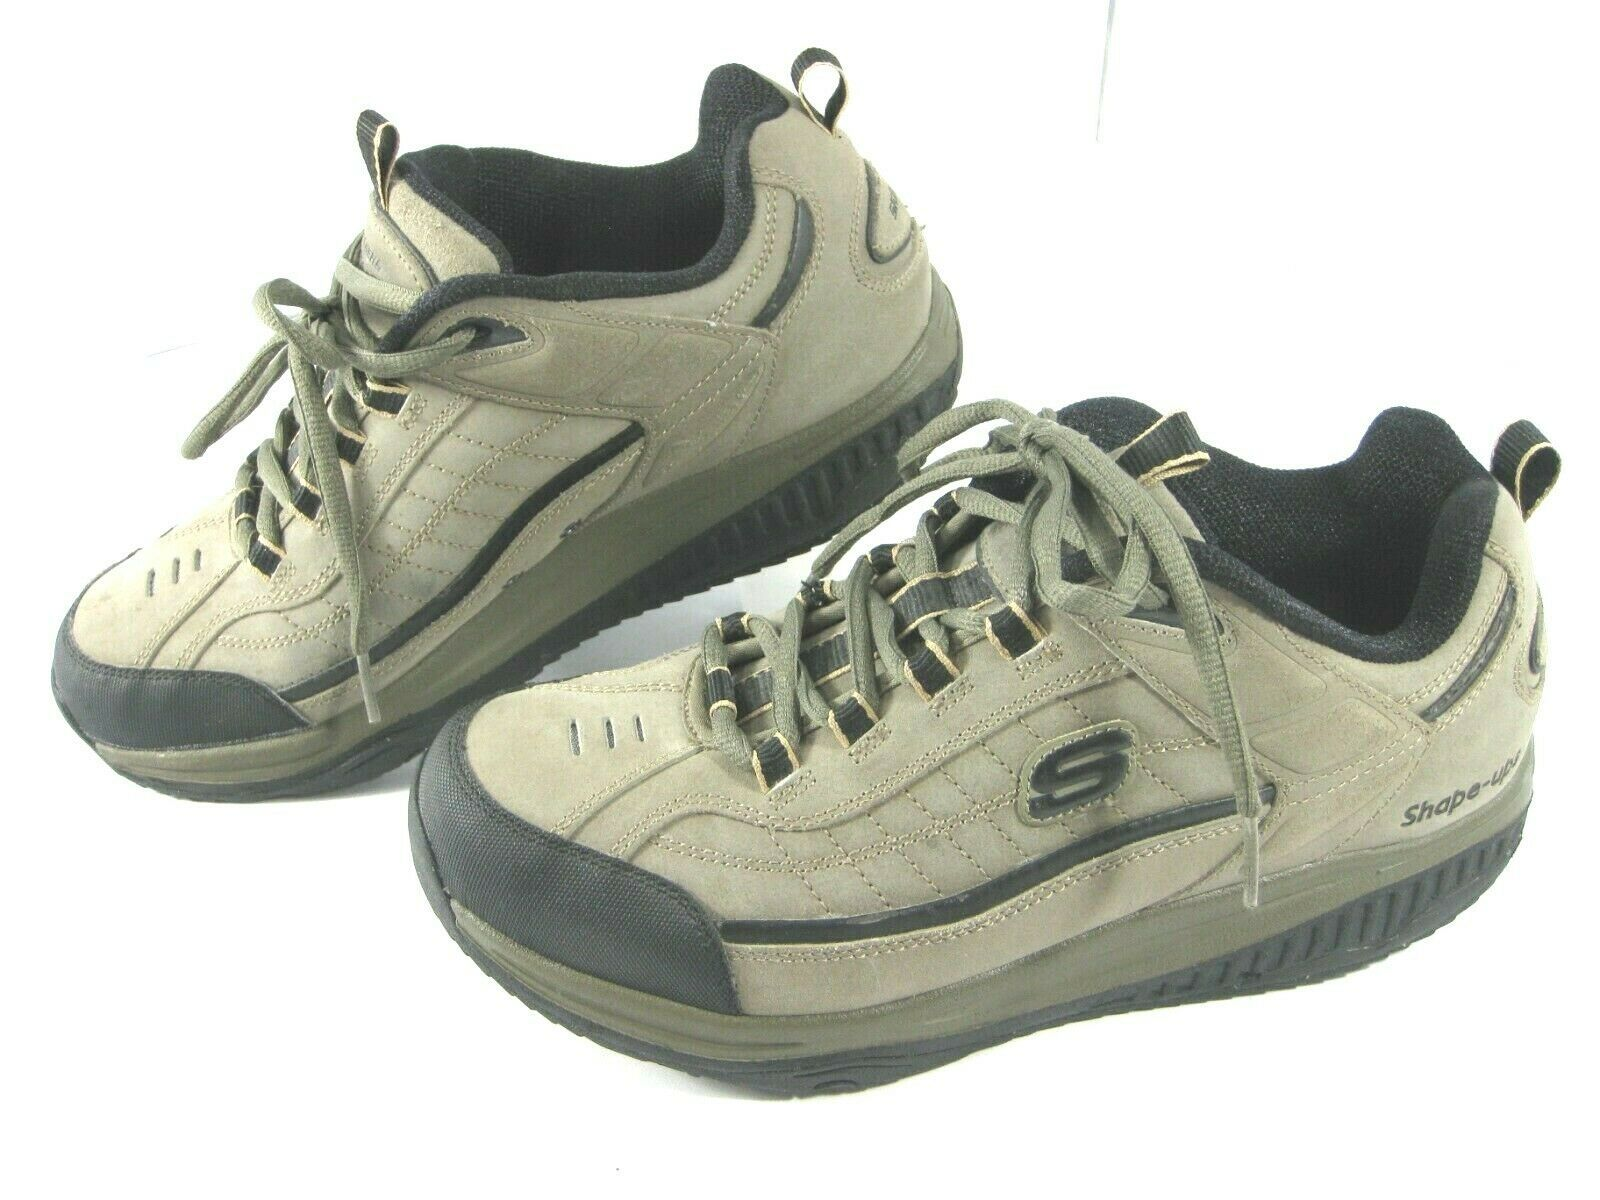 SKECHERS Shape Ups XT 52000EW Mens Athletic Walking Sneakers Shoes Size 9.5 PBL